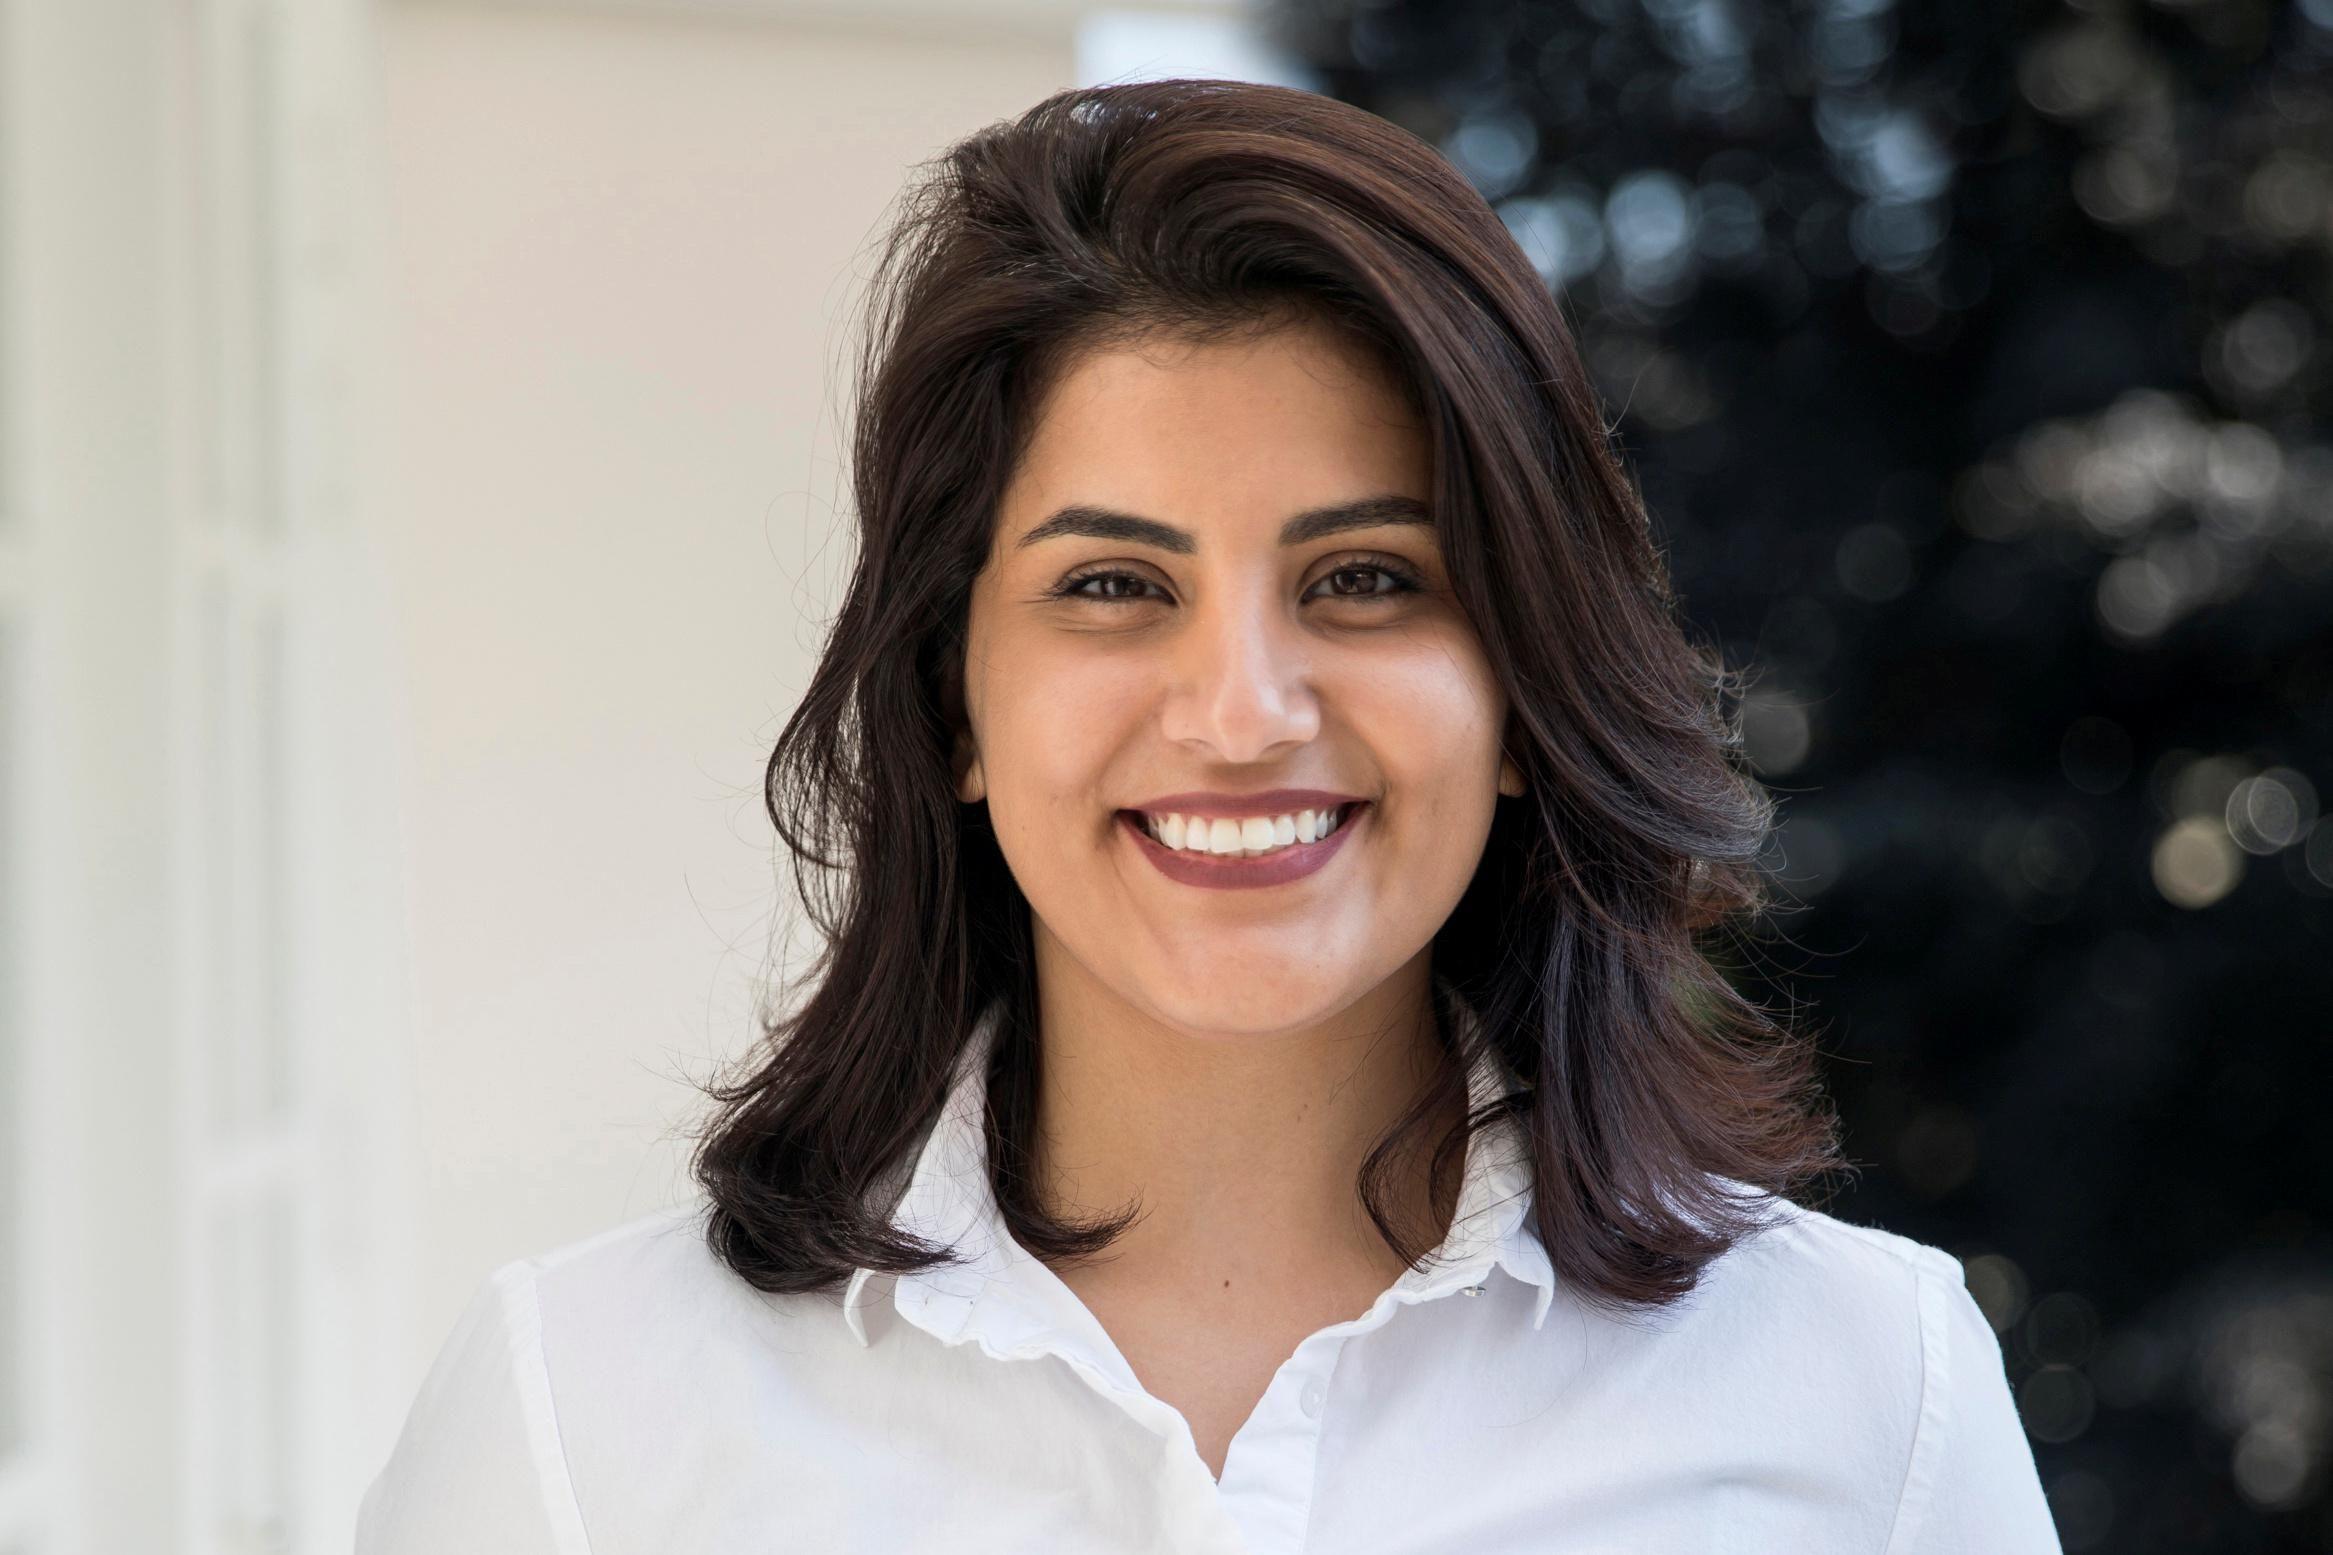 Saudi women's rights activist Loujain al-Hathloul. Reuters